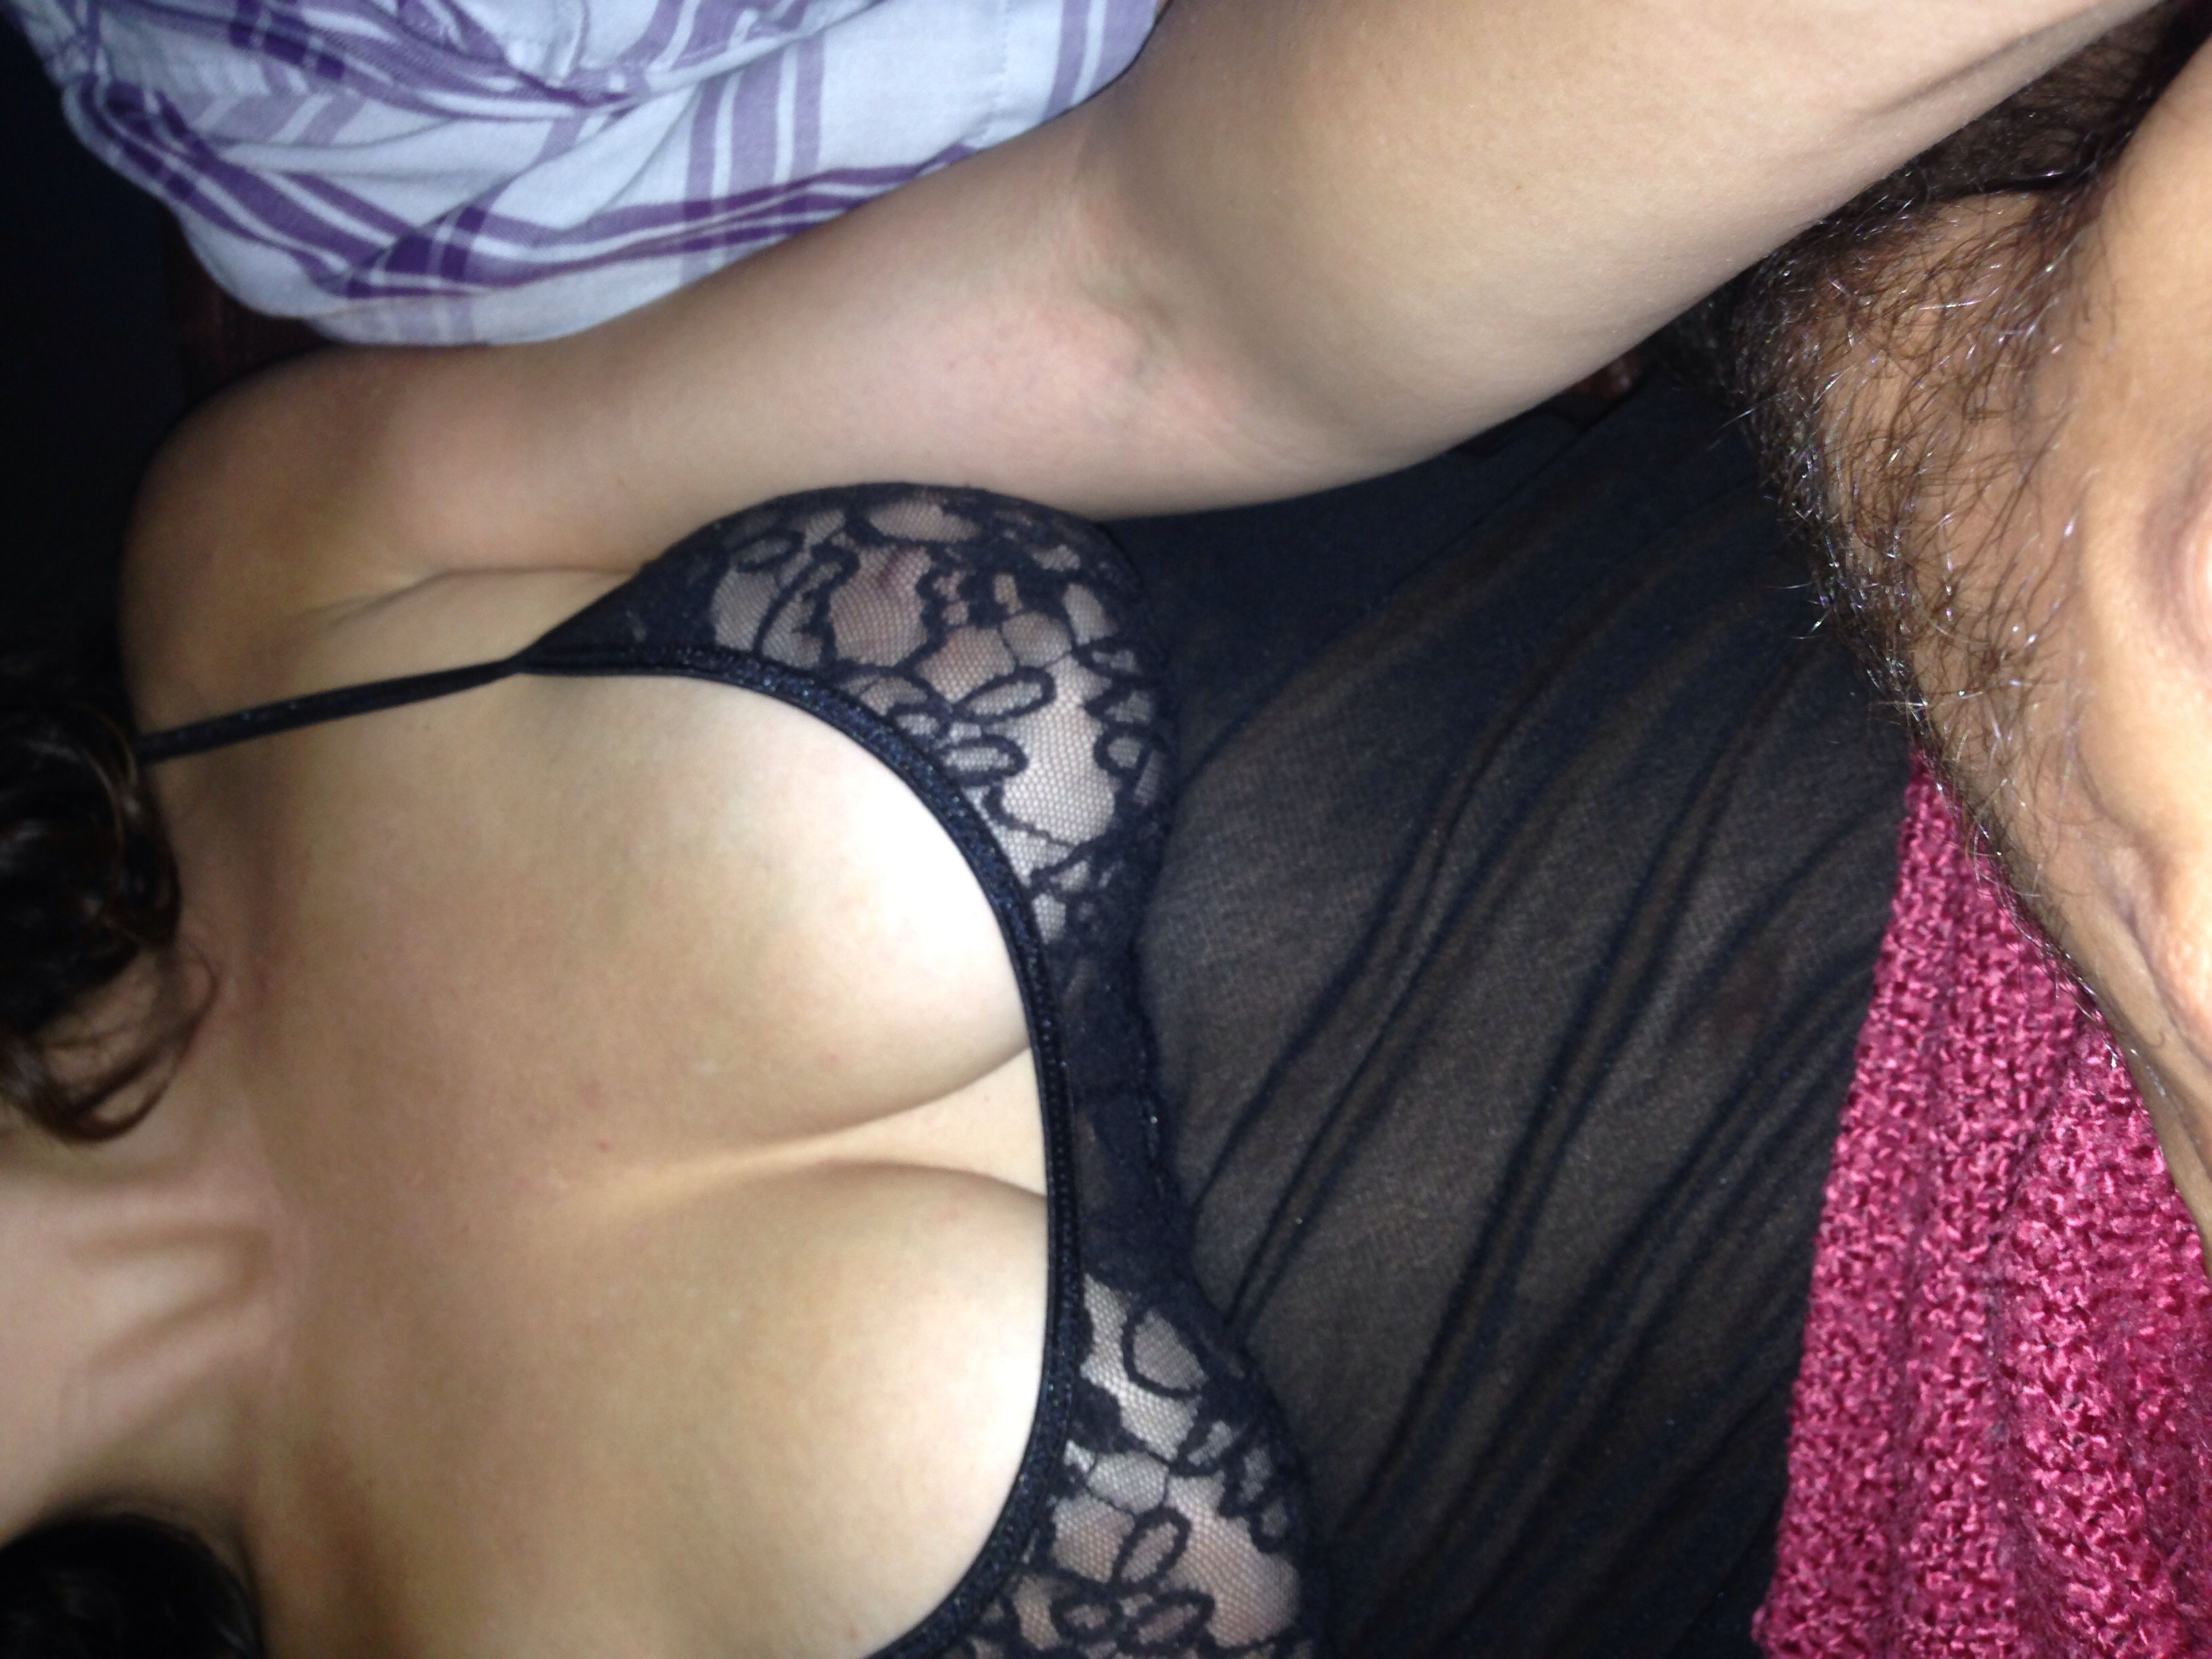 catsNbooks XOXO in lingerie